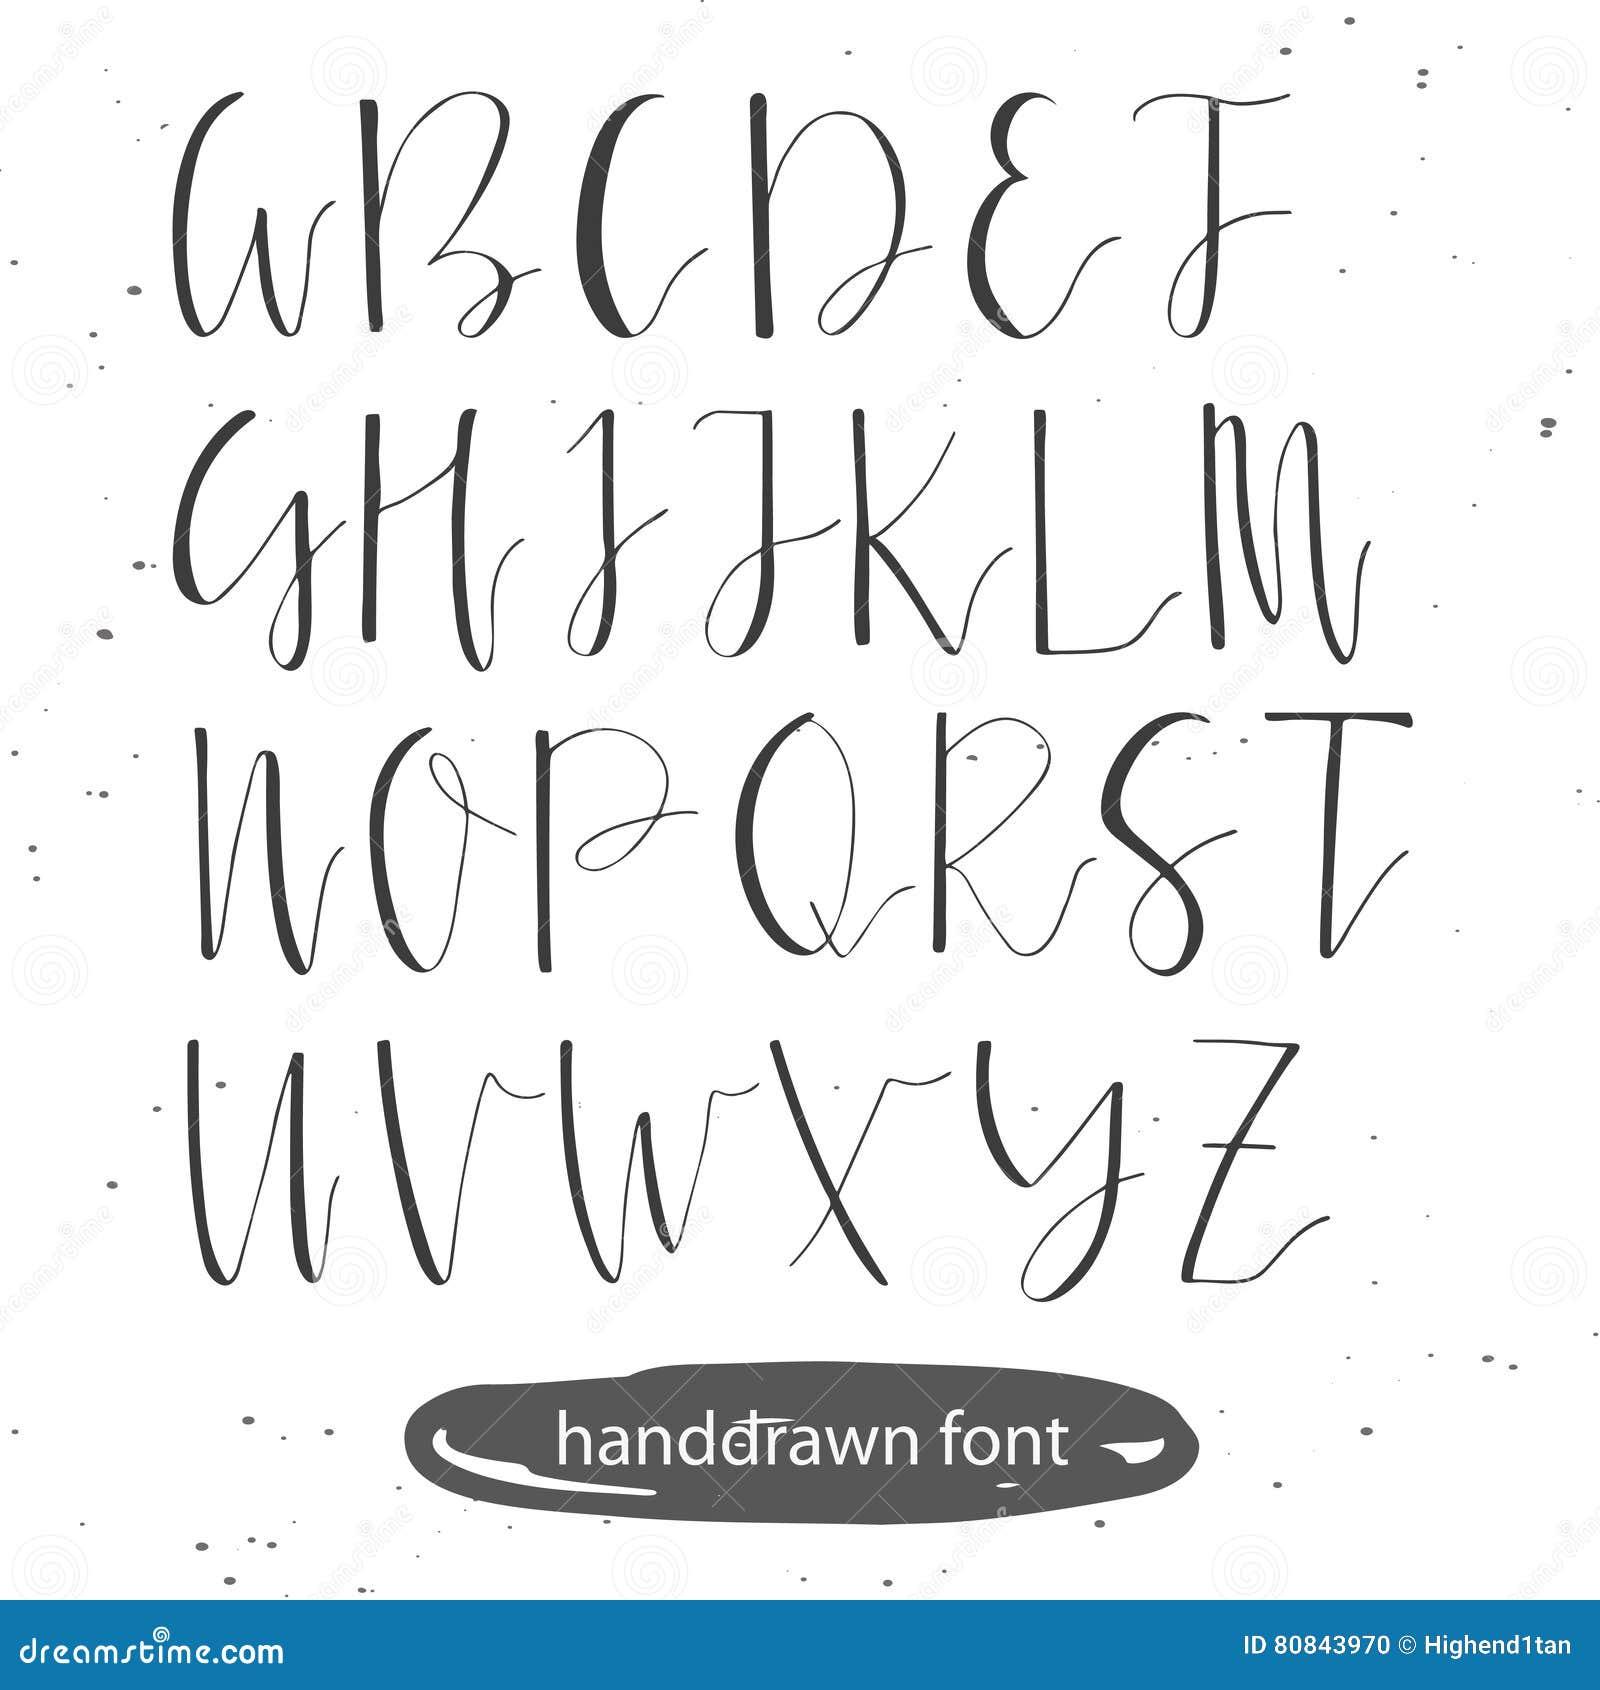 handwritten calligraphy font. stock vector - illustration of black